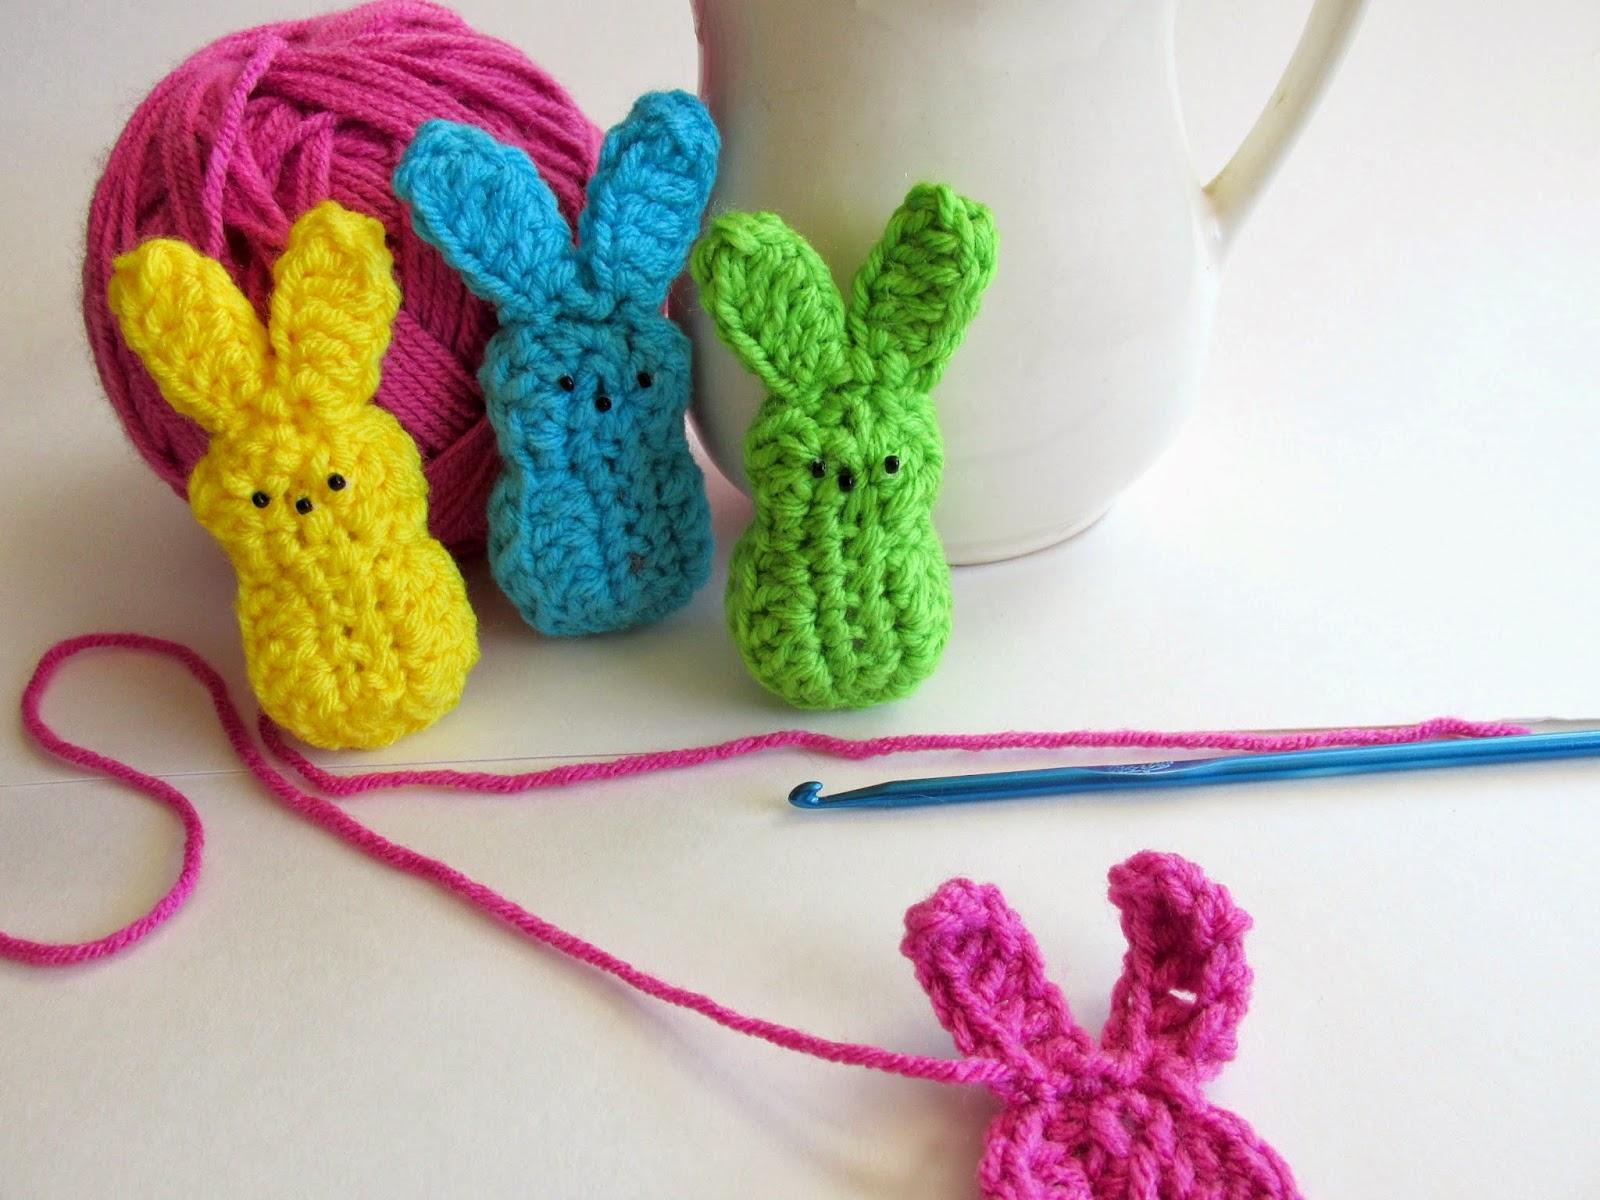 Crochet Marshmallow Peeps